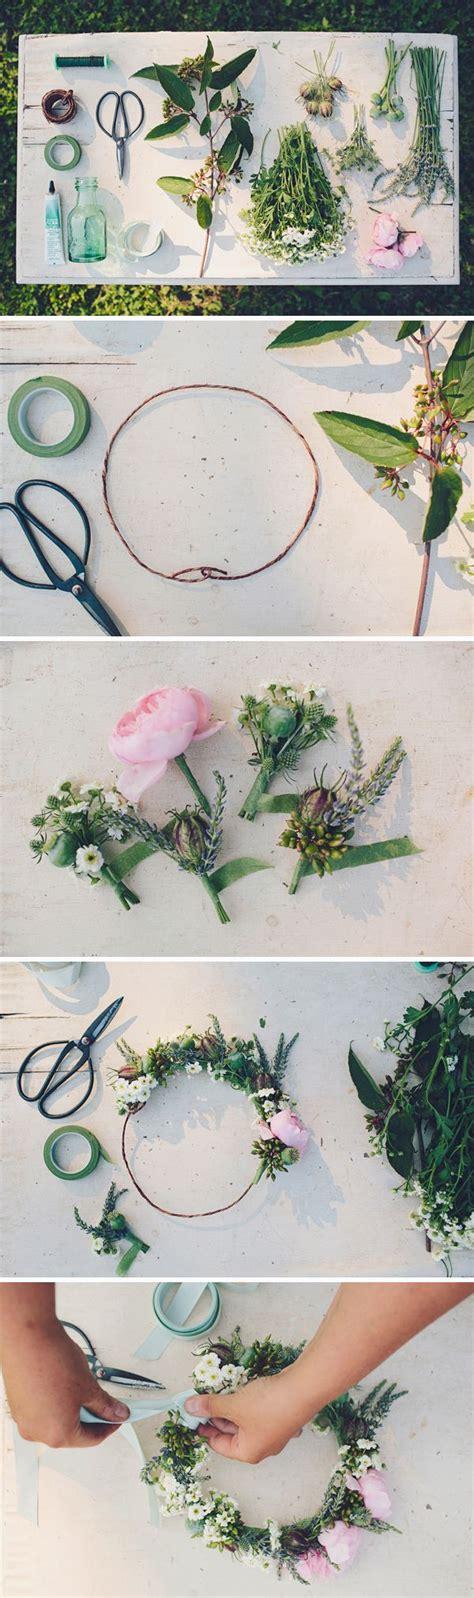 floral crown diy walk in love diy craft s